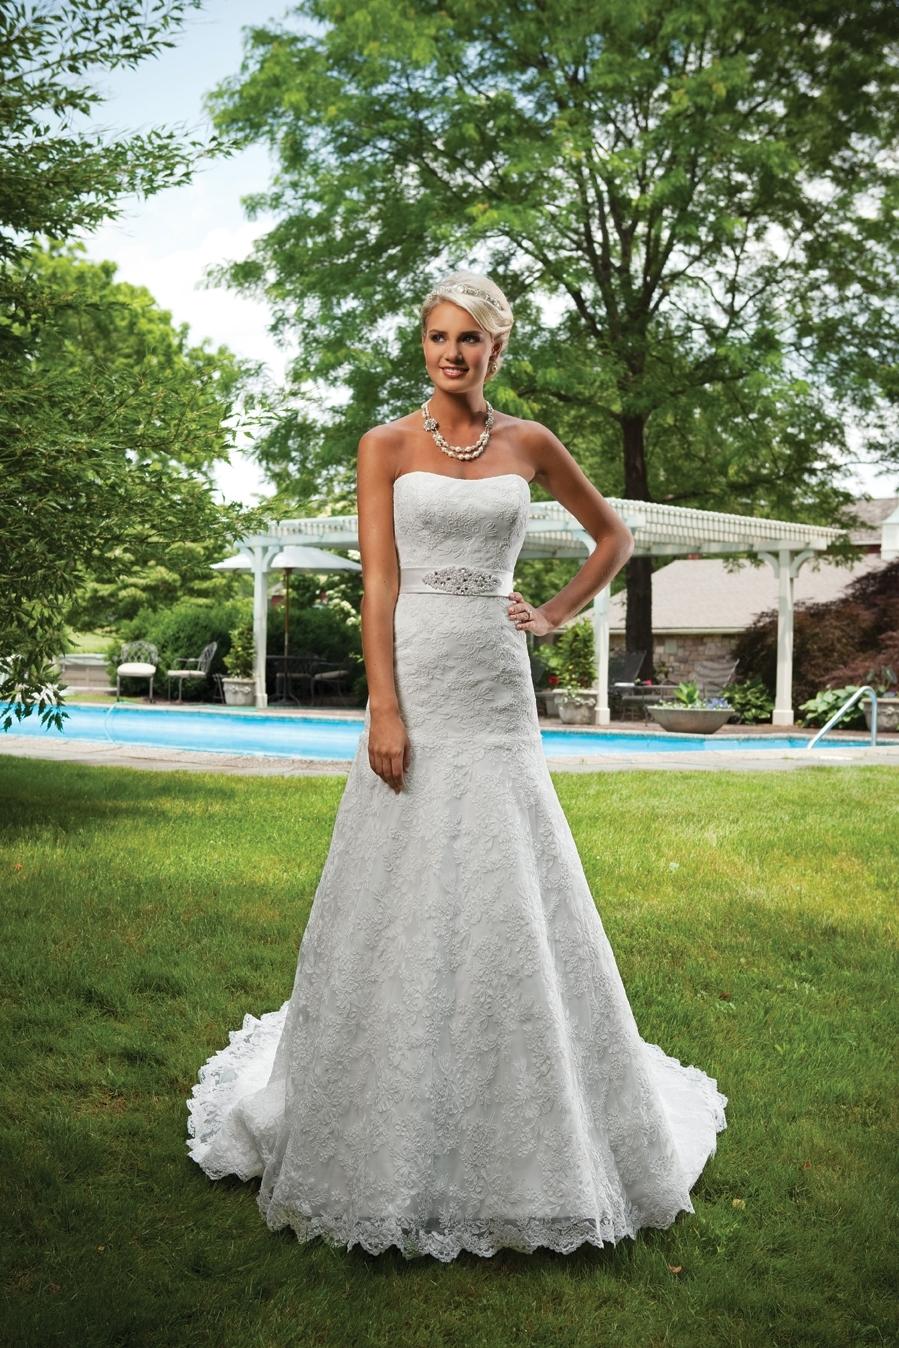 E231125-spring-2011-wedding-dress-2bebride-kathy-ireland.full